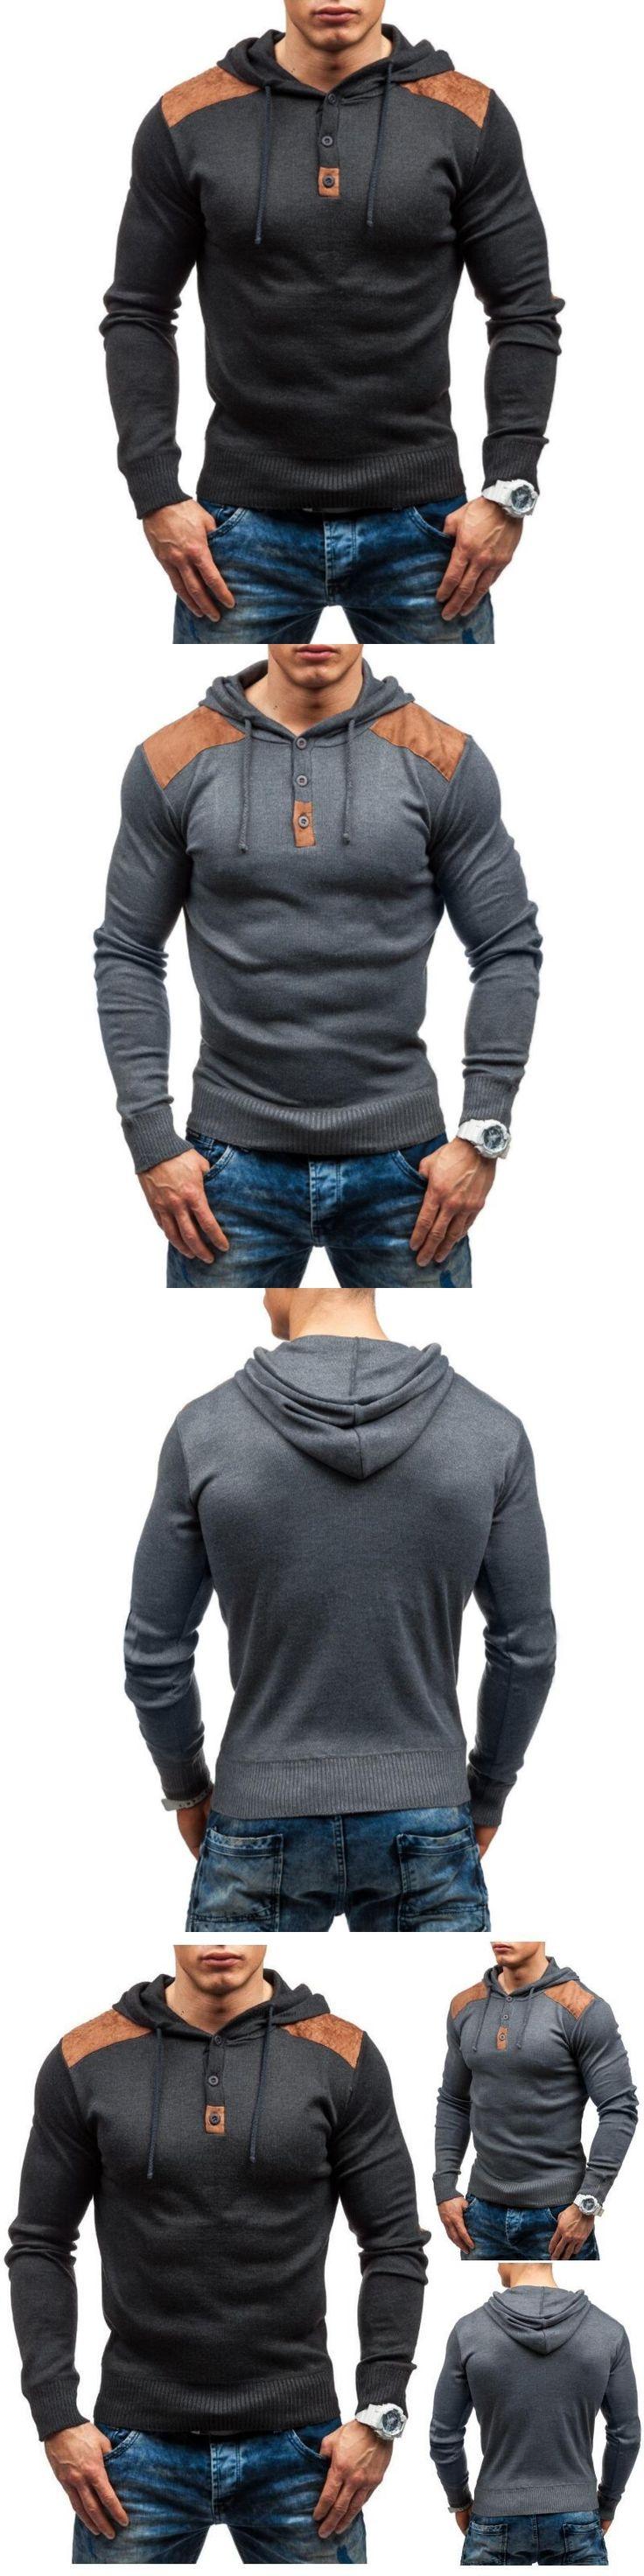 Brand 2017 Hoodie Classic Fashion Solid Color Casual Hoodies Men Fashion Tracksuit Male Sweatshirt Hoody Mens Purpose Tour